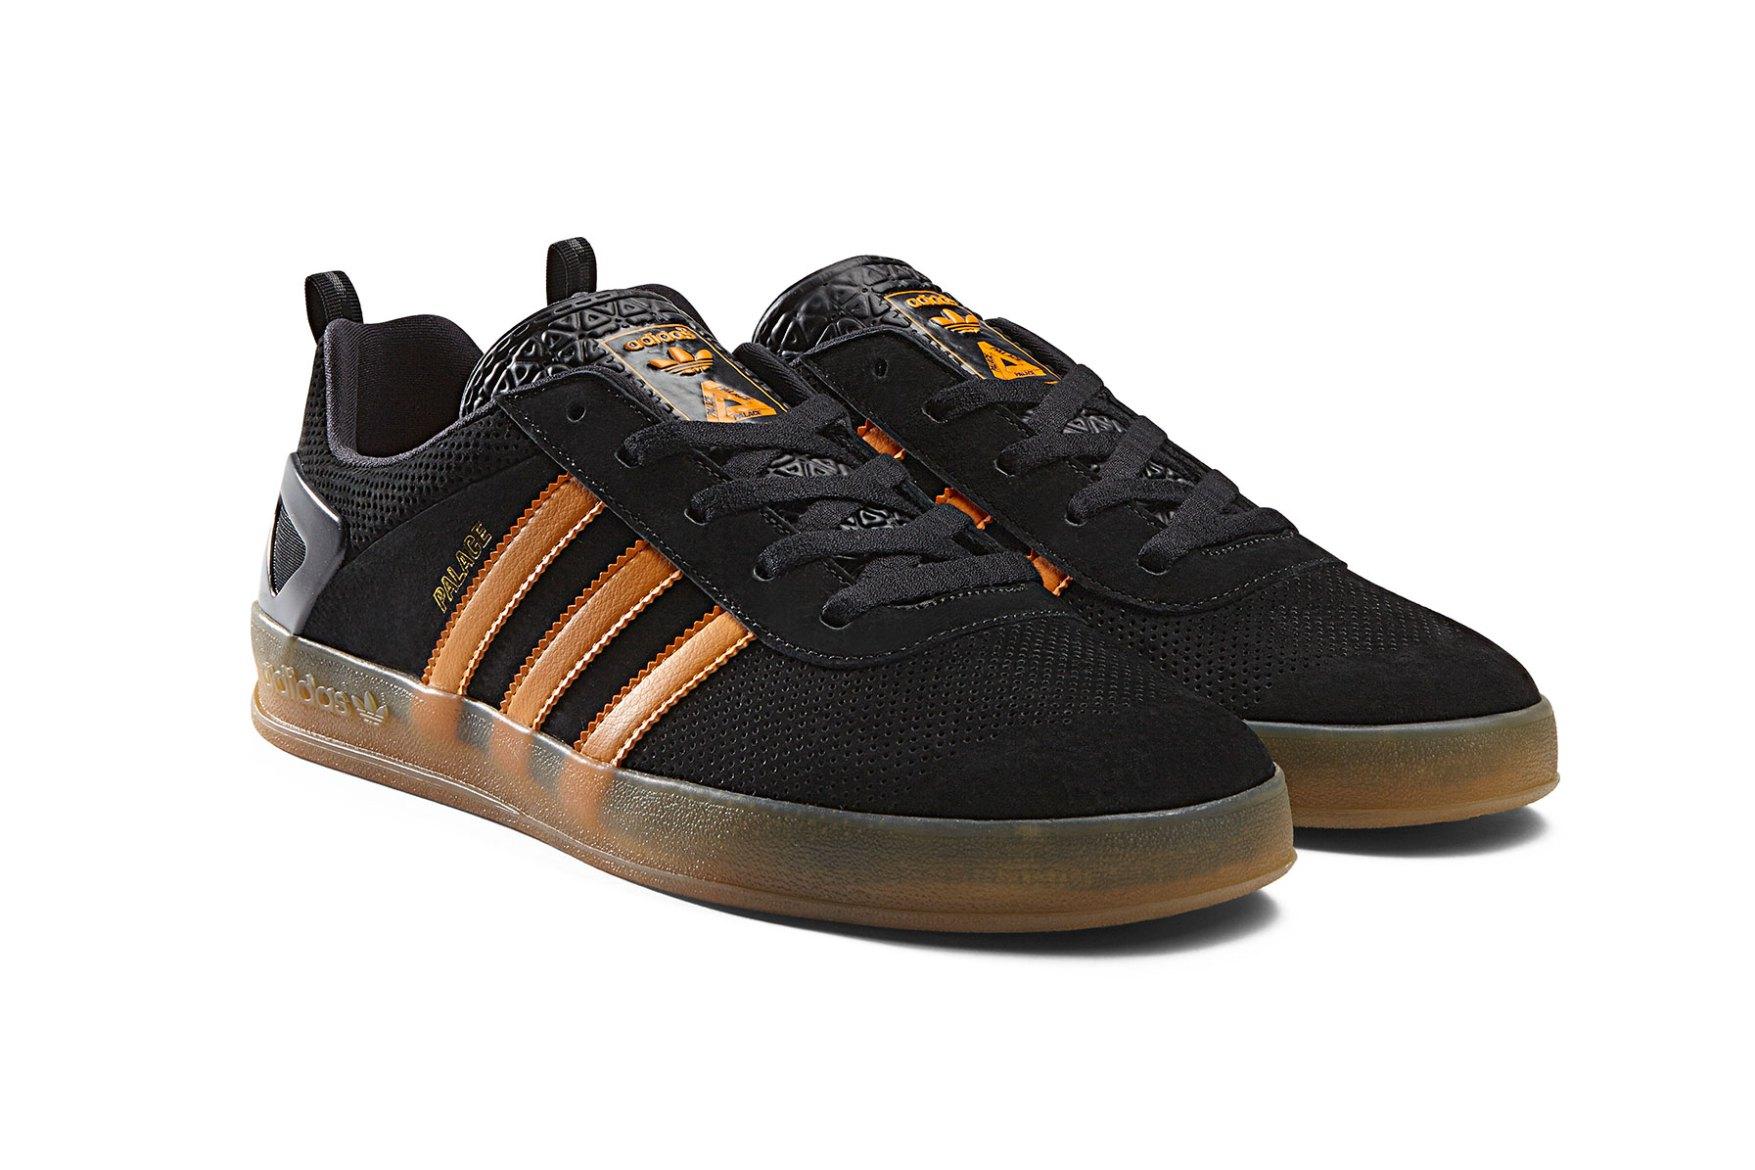 palace-adidas-originals-footwear-palace-pro-3